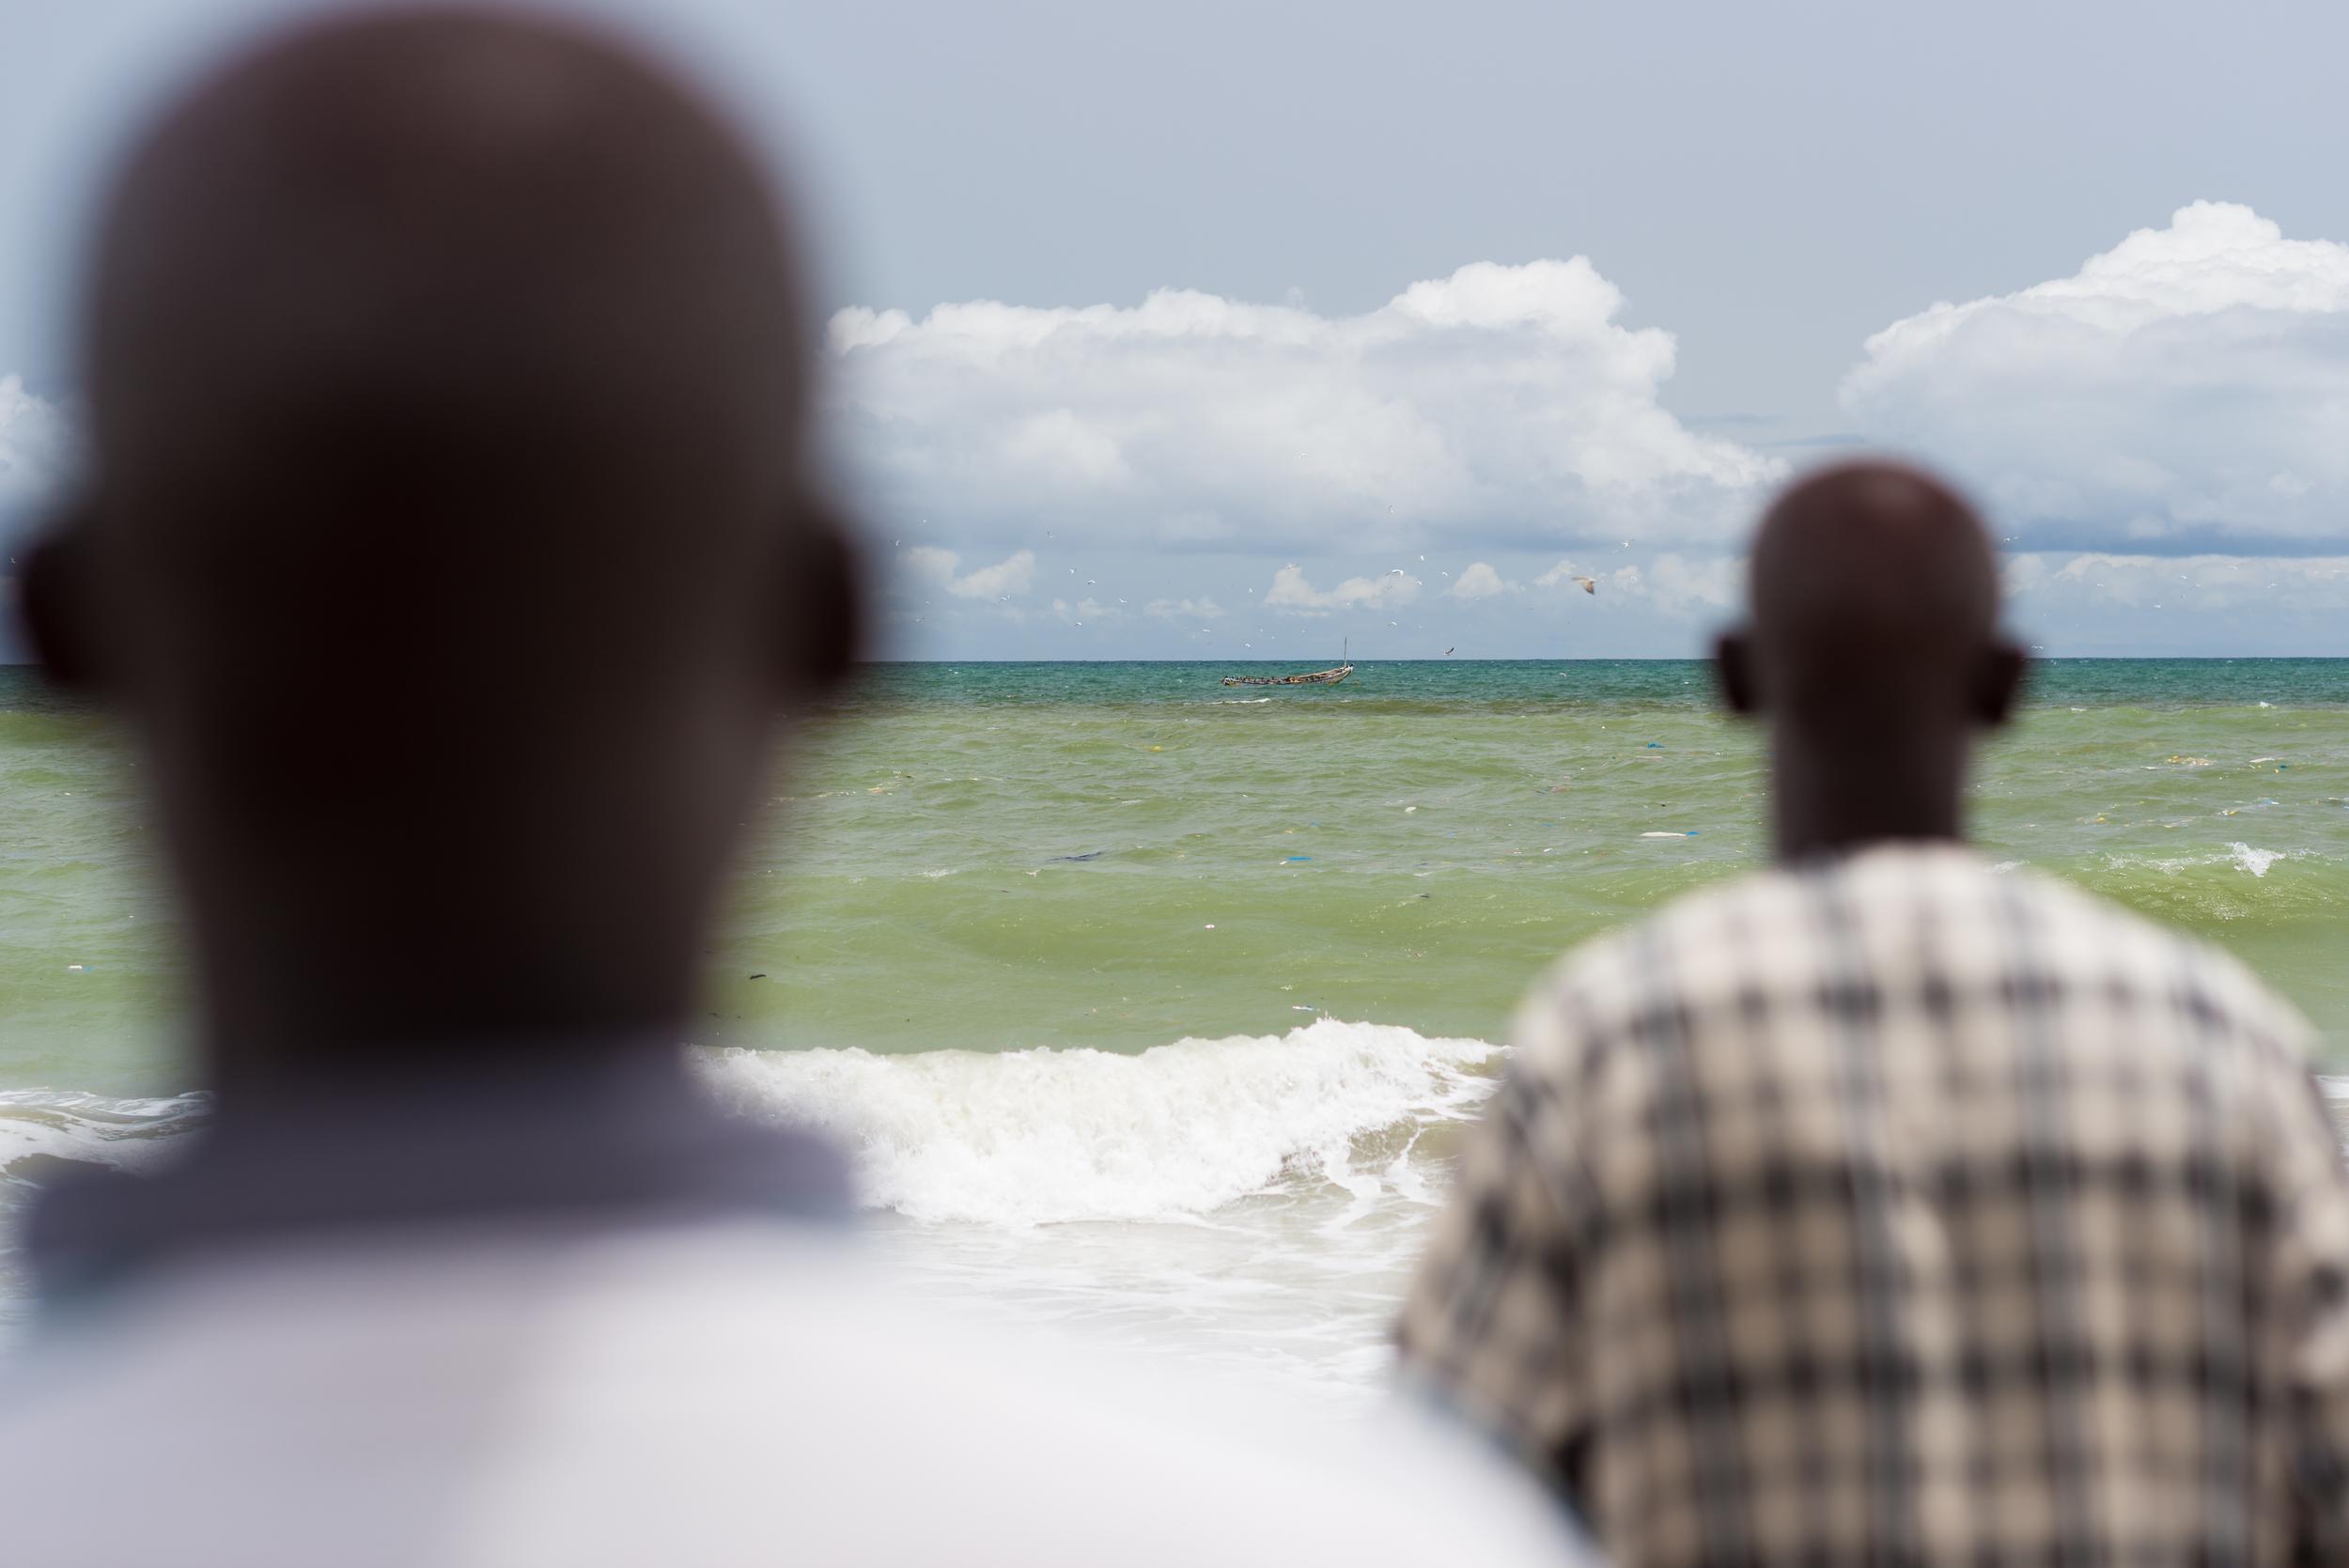 Fathers of Lost Fishermen in Senegal © Clément Tardif / Greenpeace